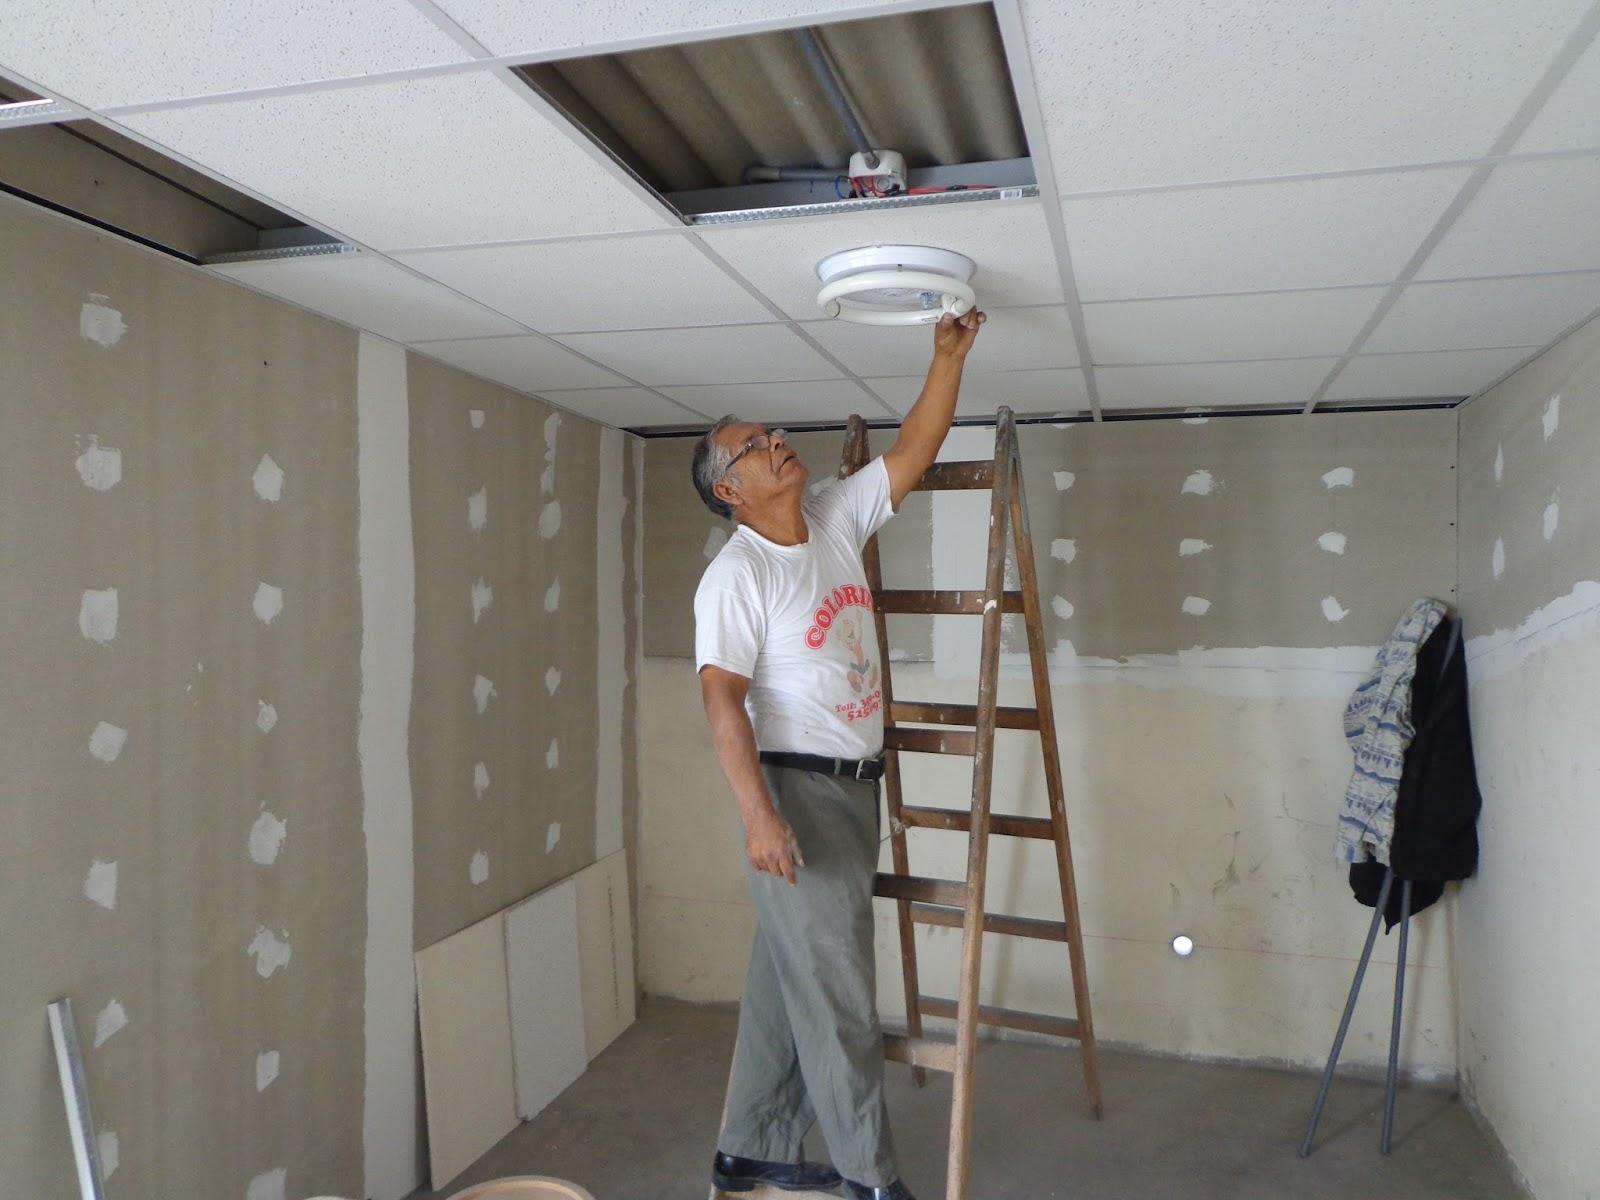 Casas prefabricadas drywall estructuras metalicas lima peru - Estructura metalicas para casas ...